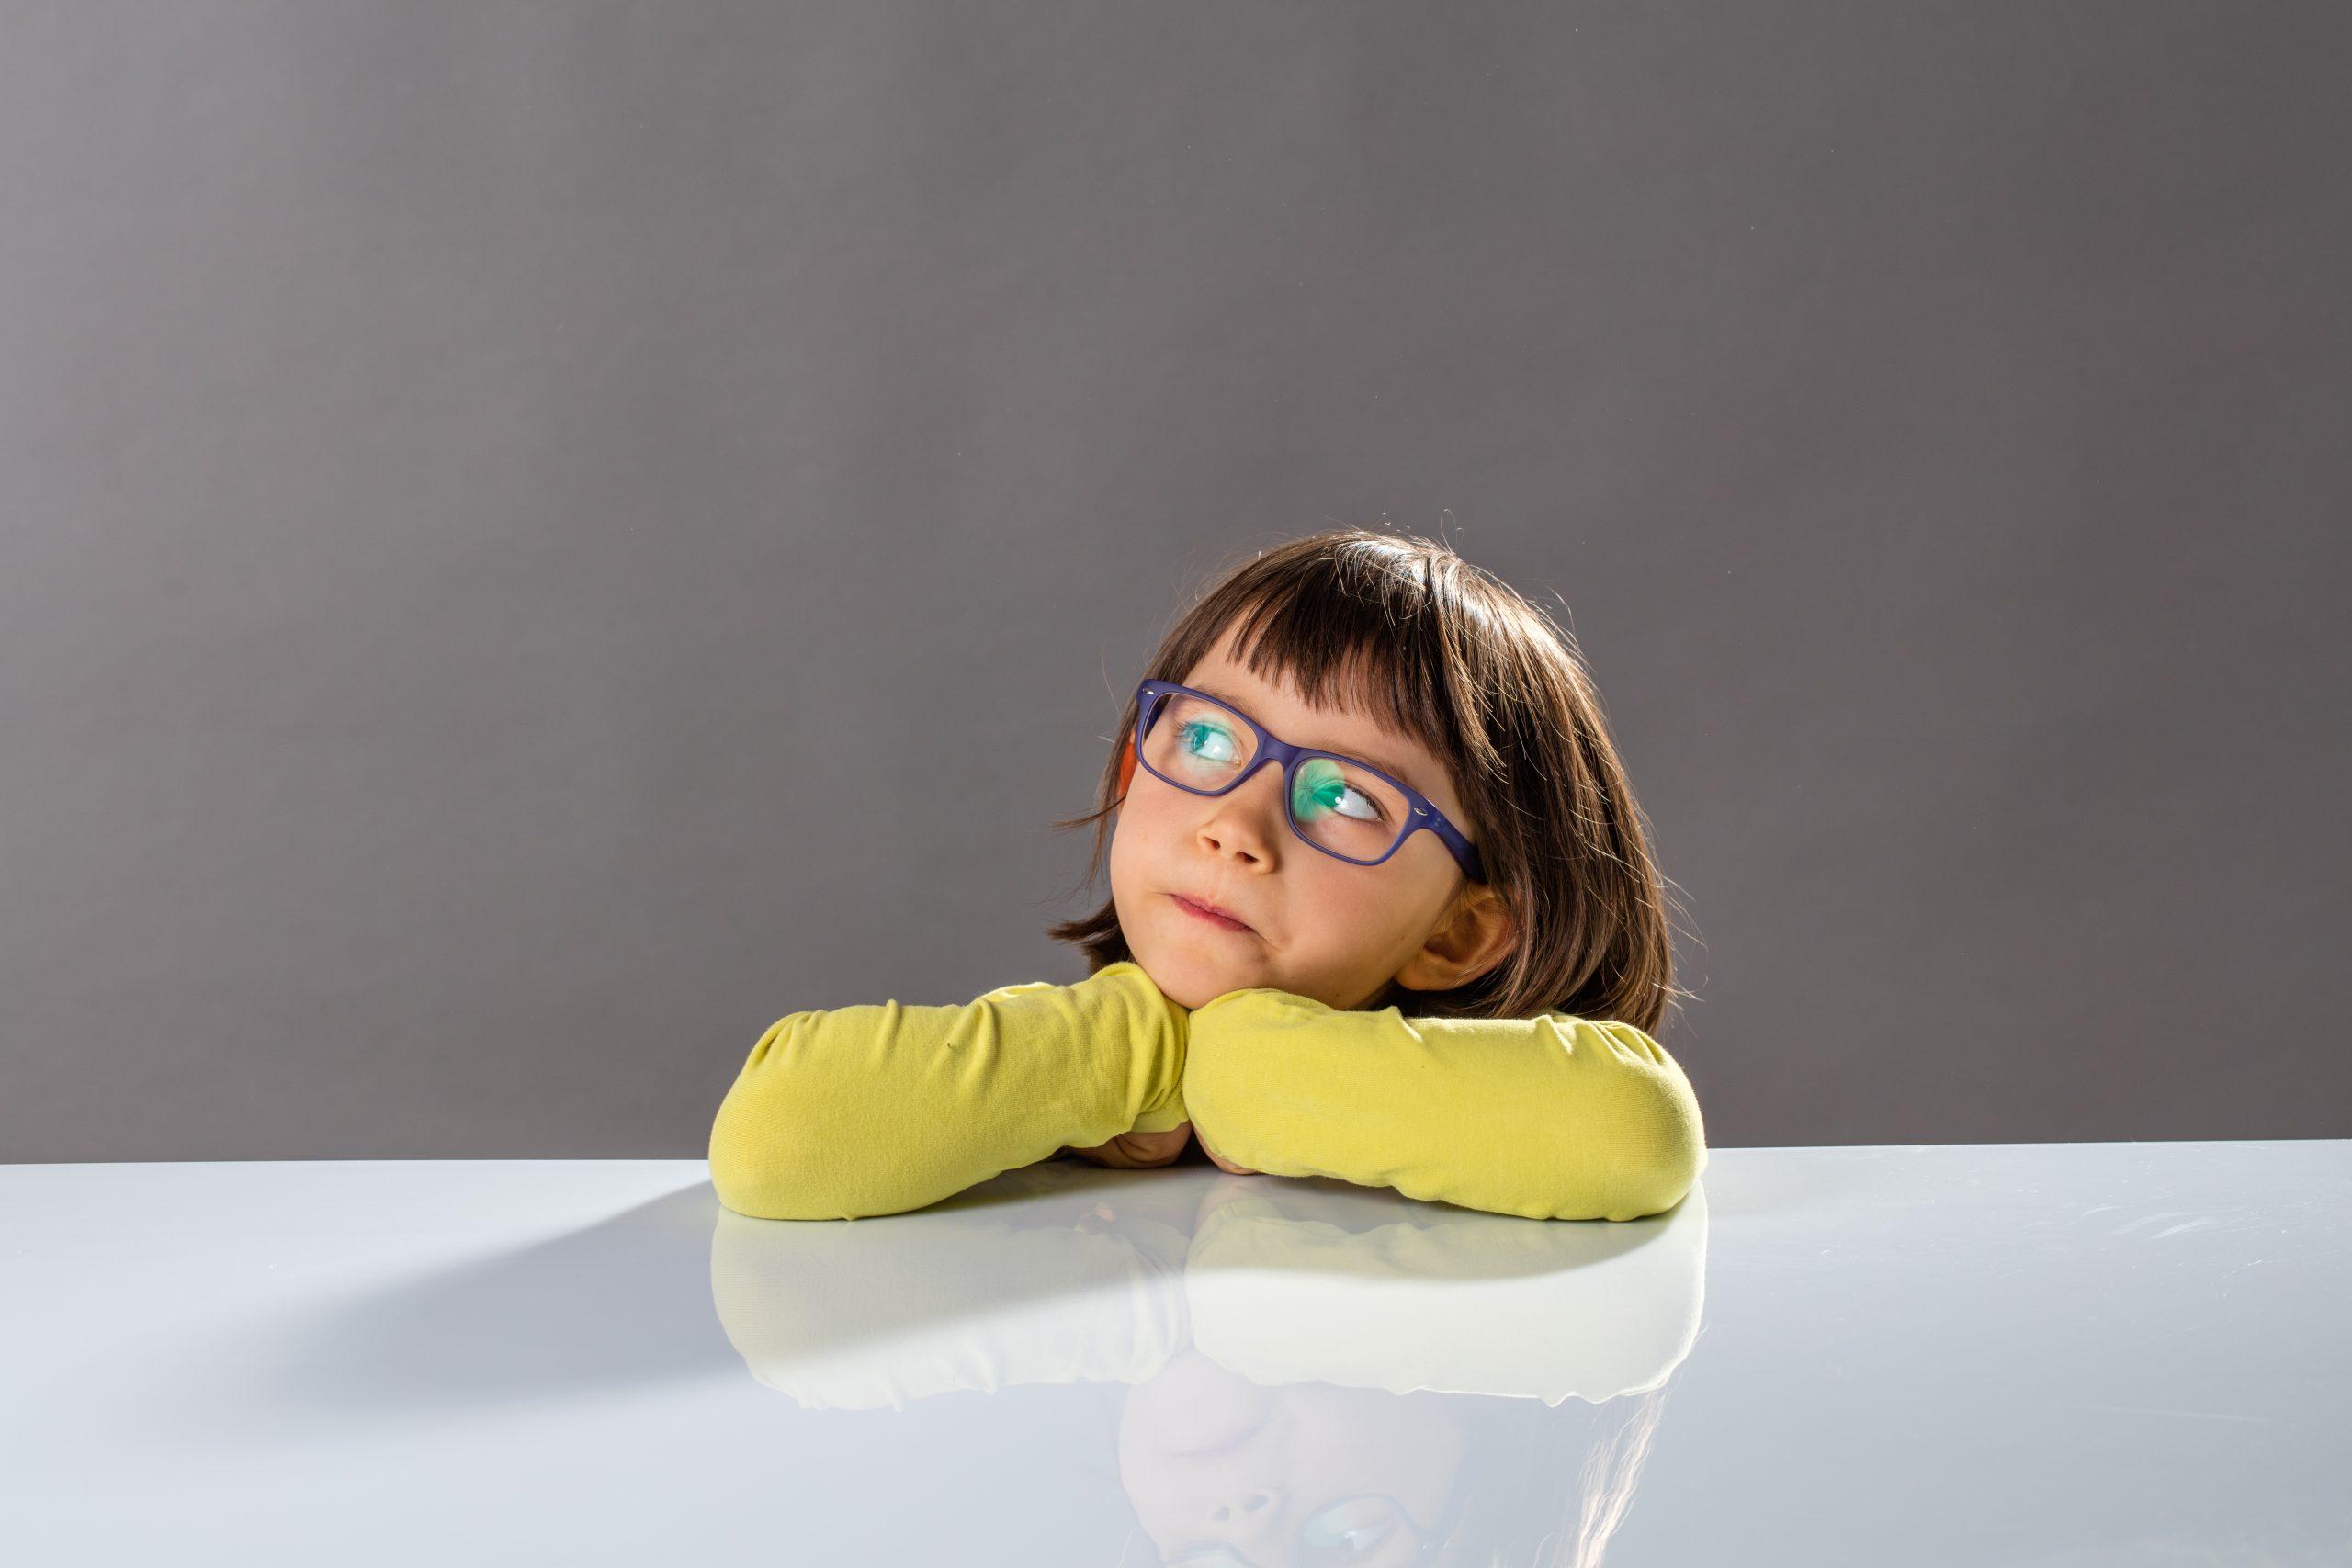 Upsoftskills - Critical thinking course for kids